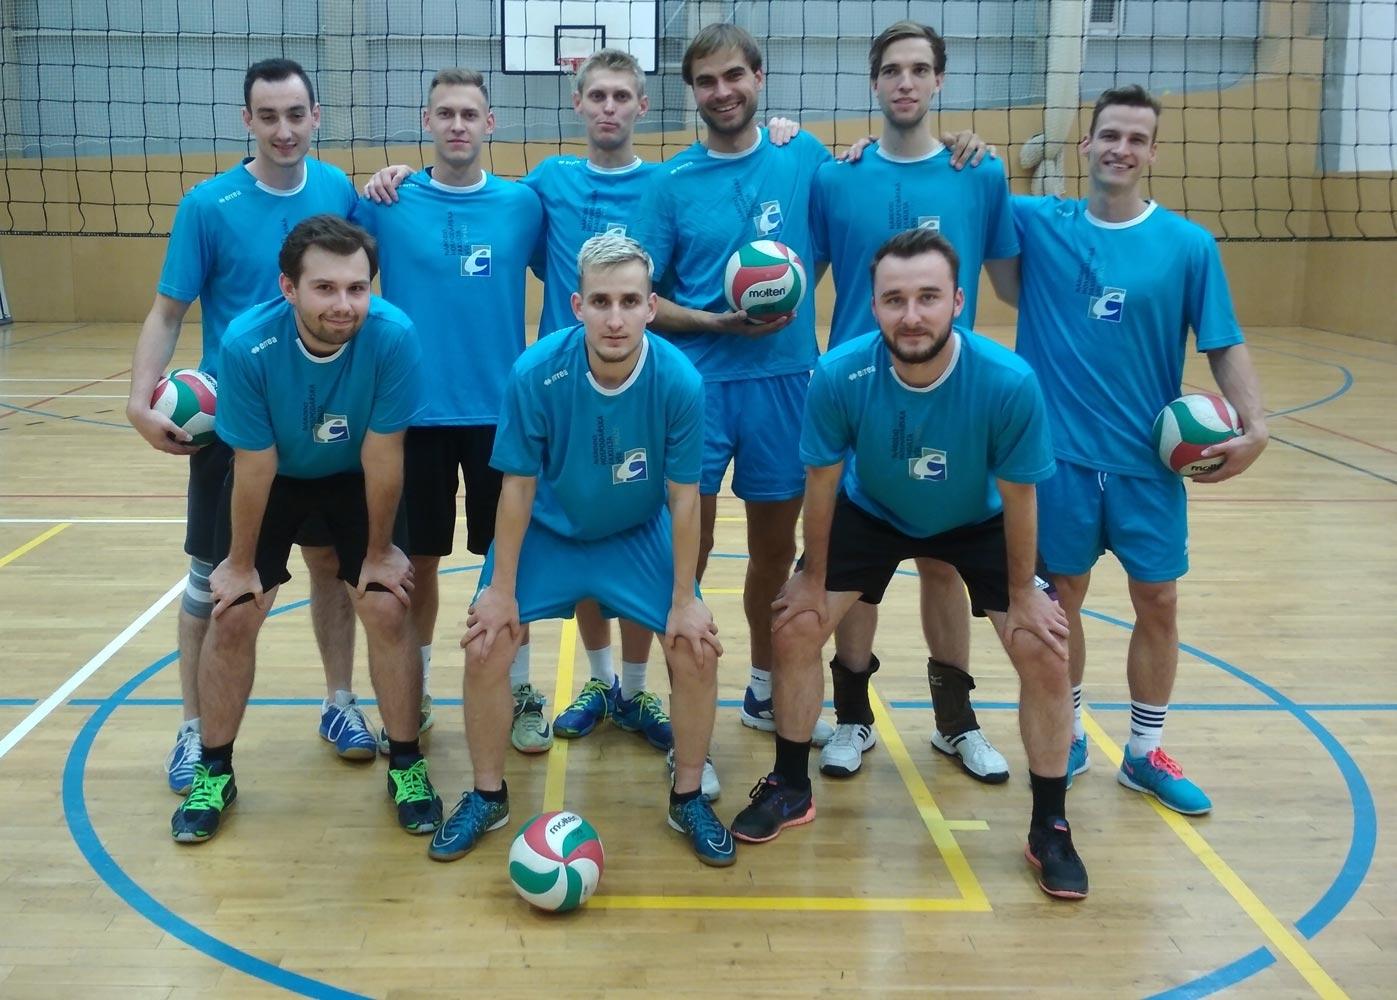 7. ročník - Volejbalová liga VŠE - Tým NF muži